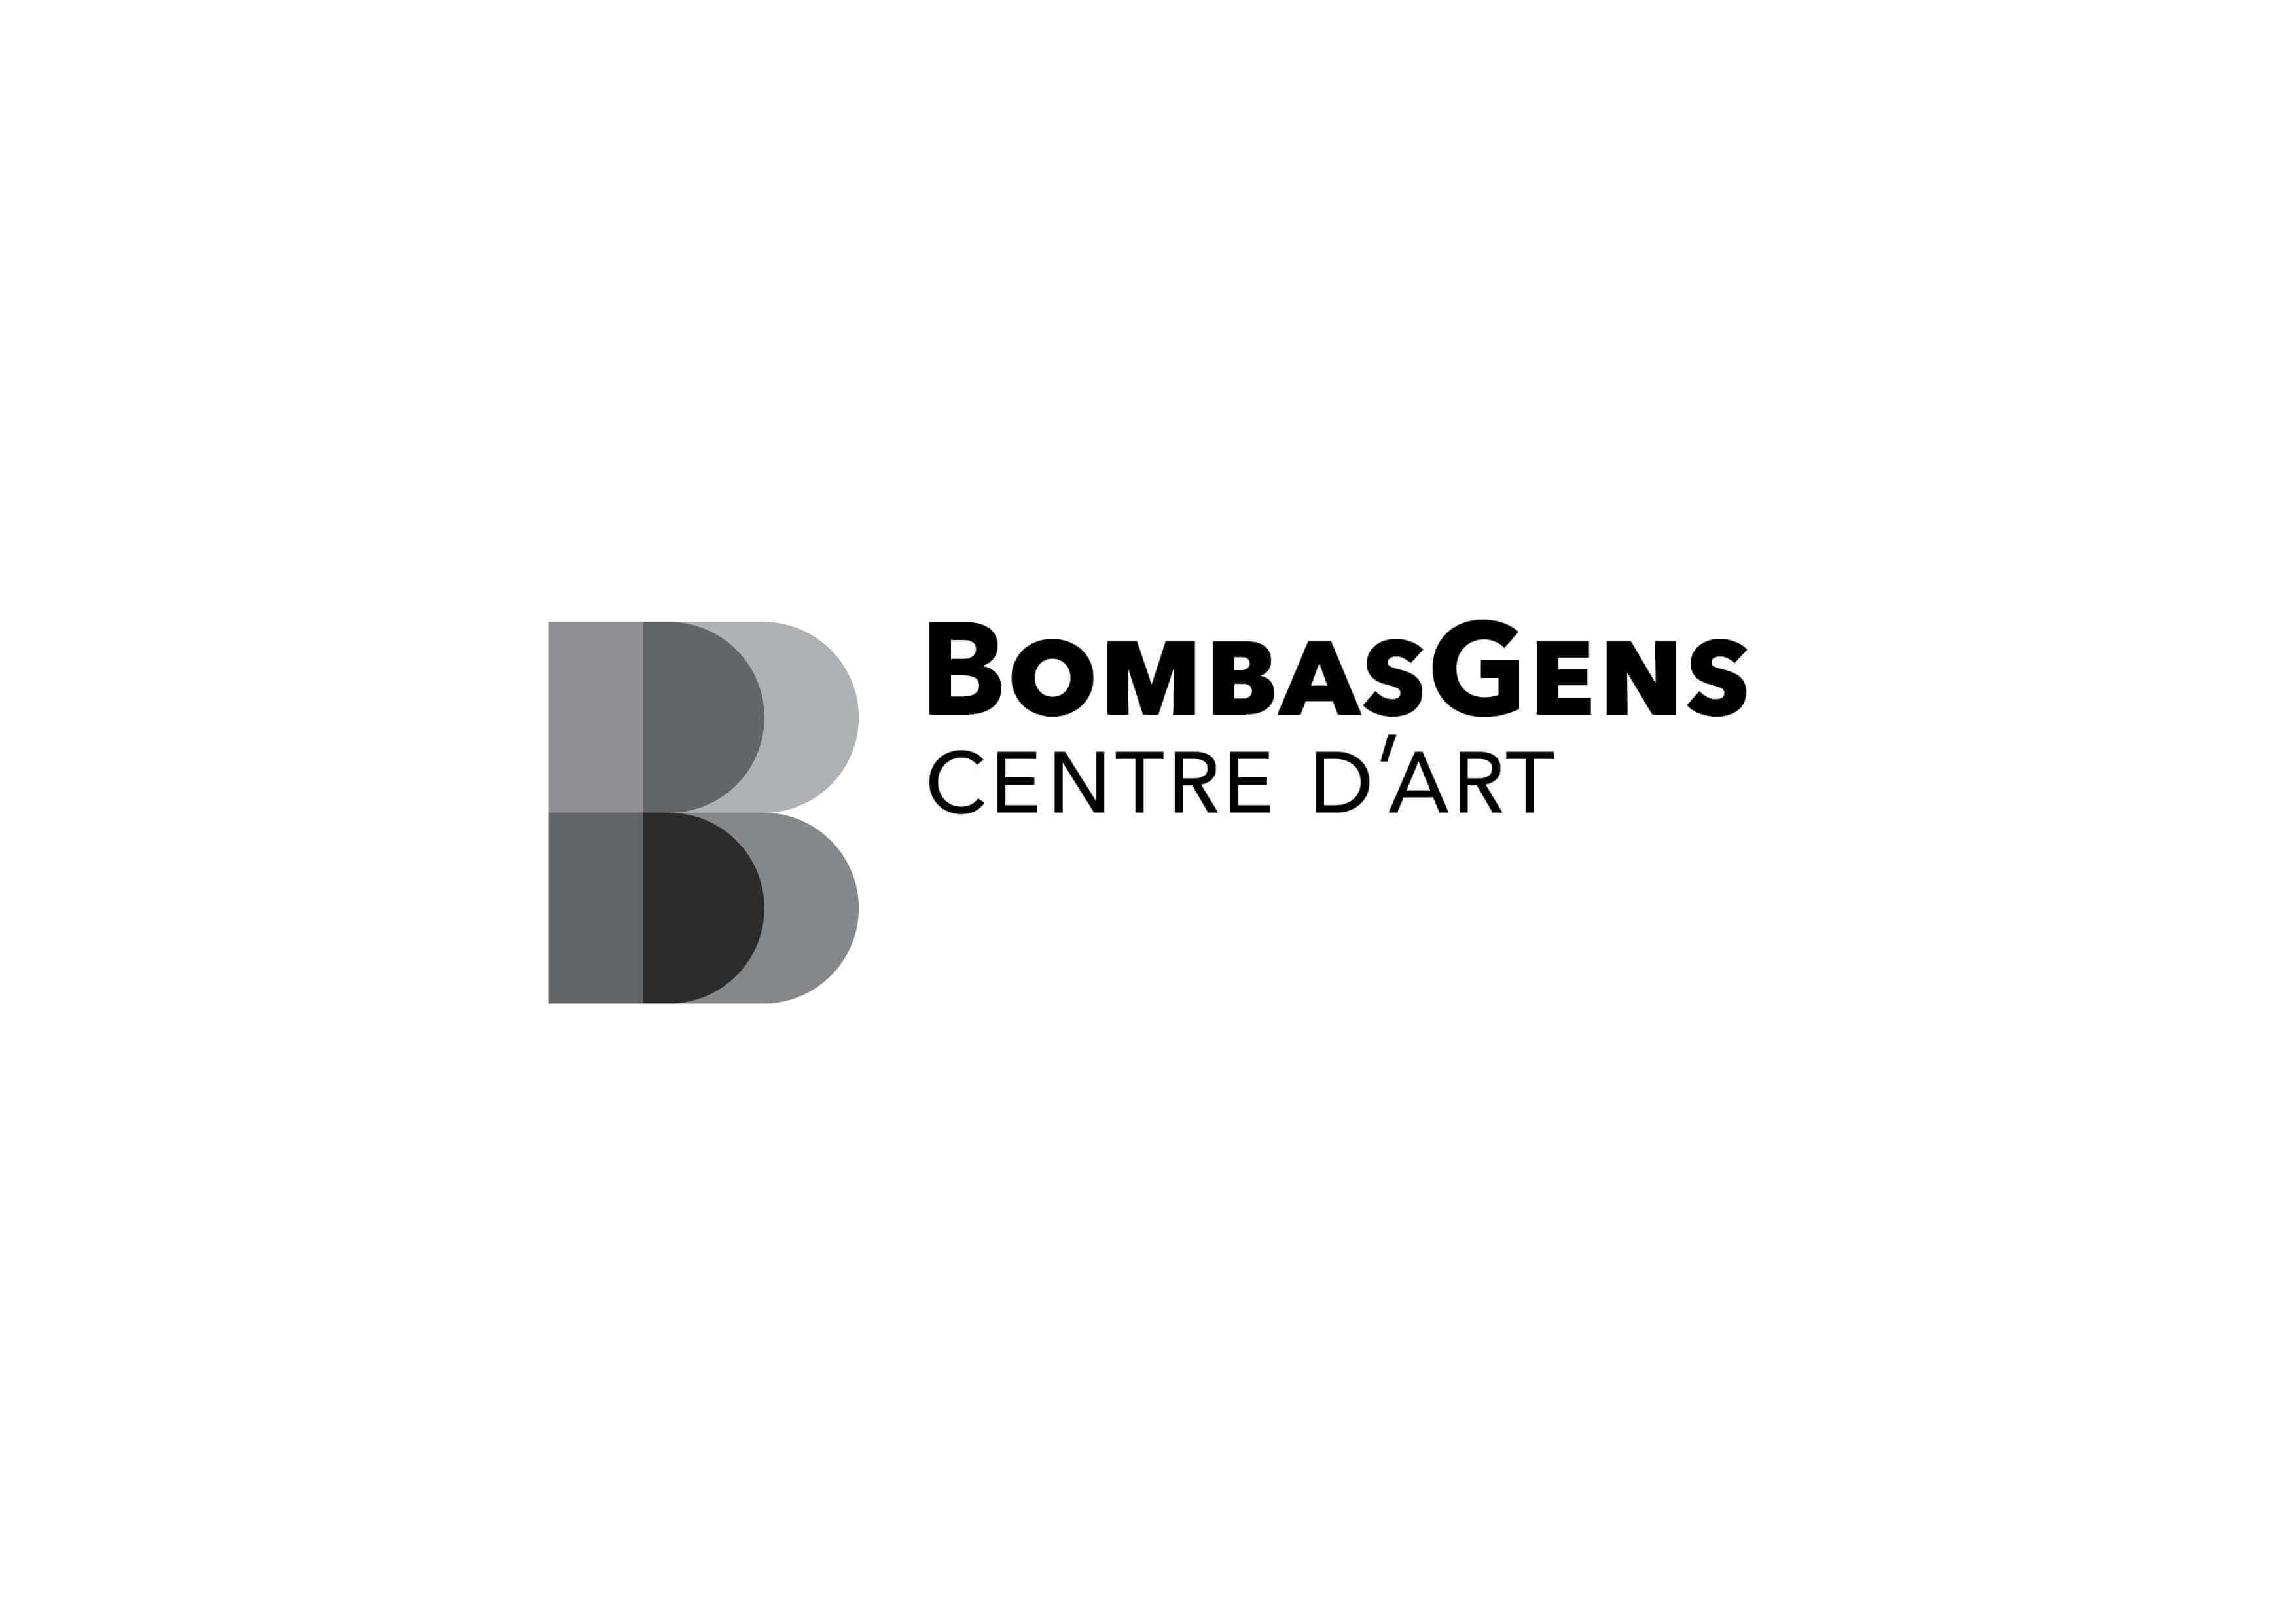 BombasGens_Identidad3